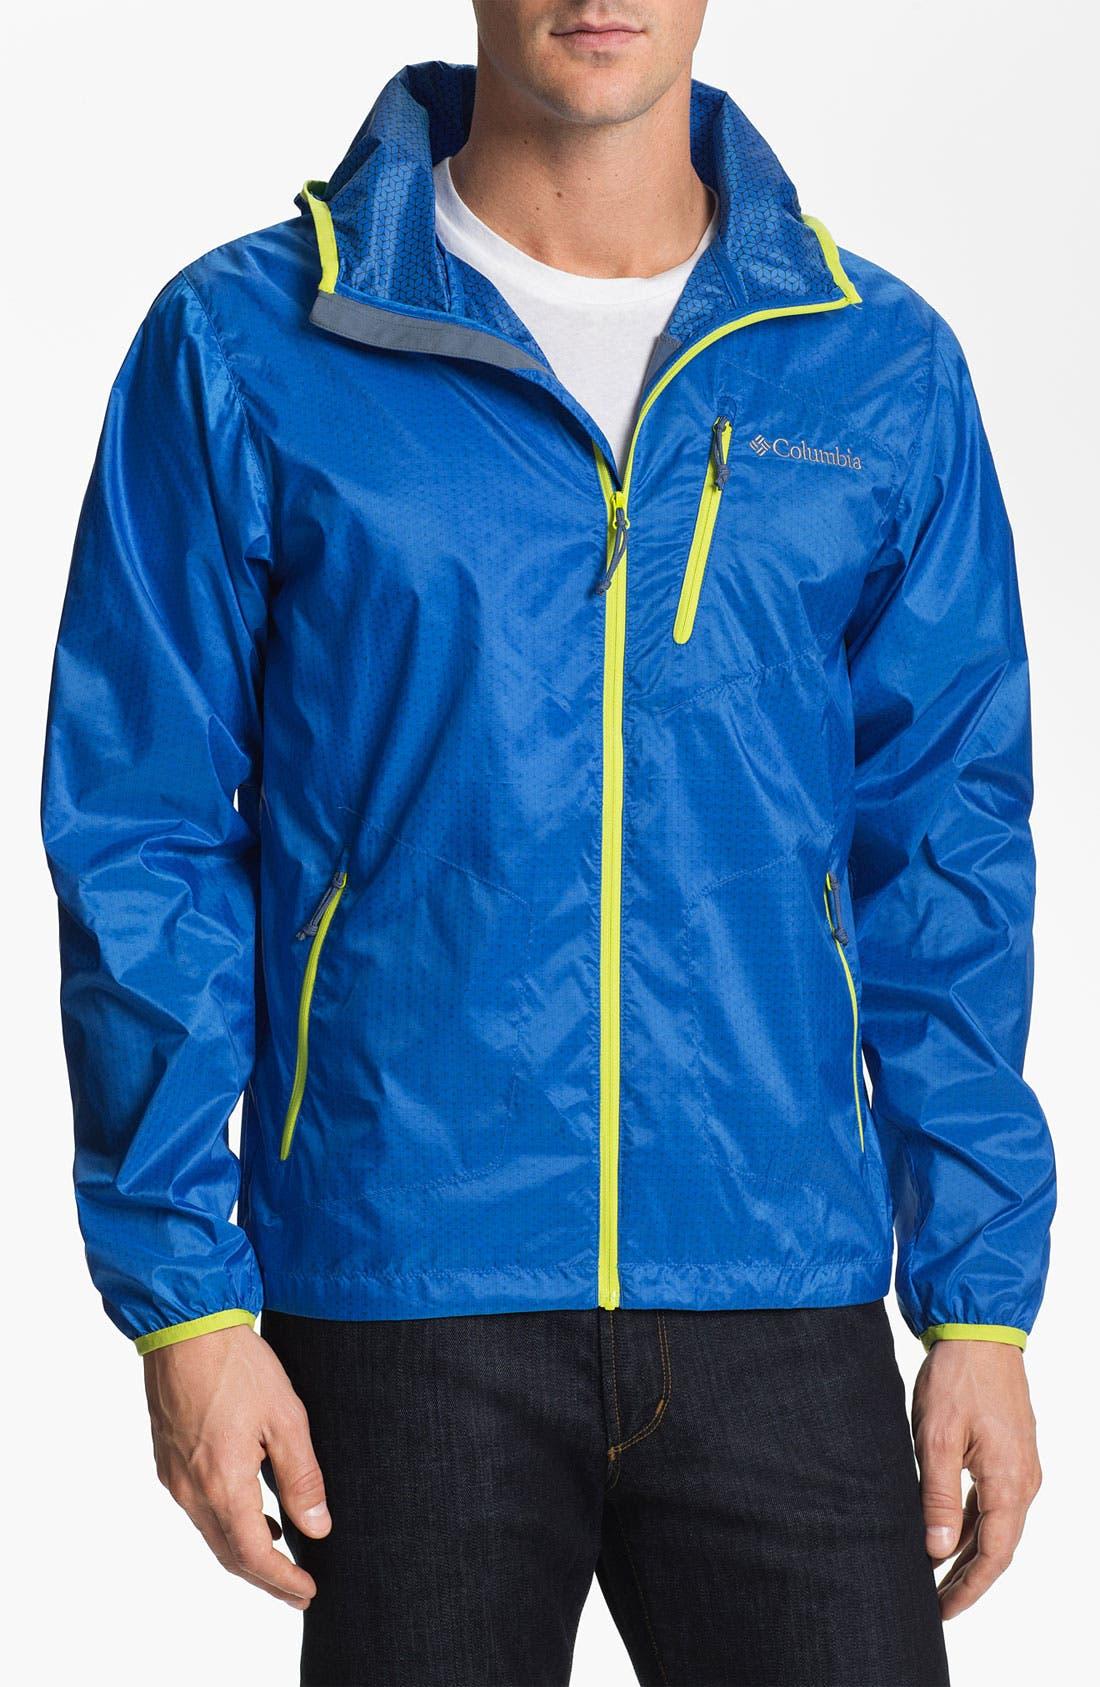 Alternate Image 1 Selected - Columbia 'Trail Drier™' Windbreaker Jacket